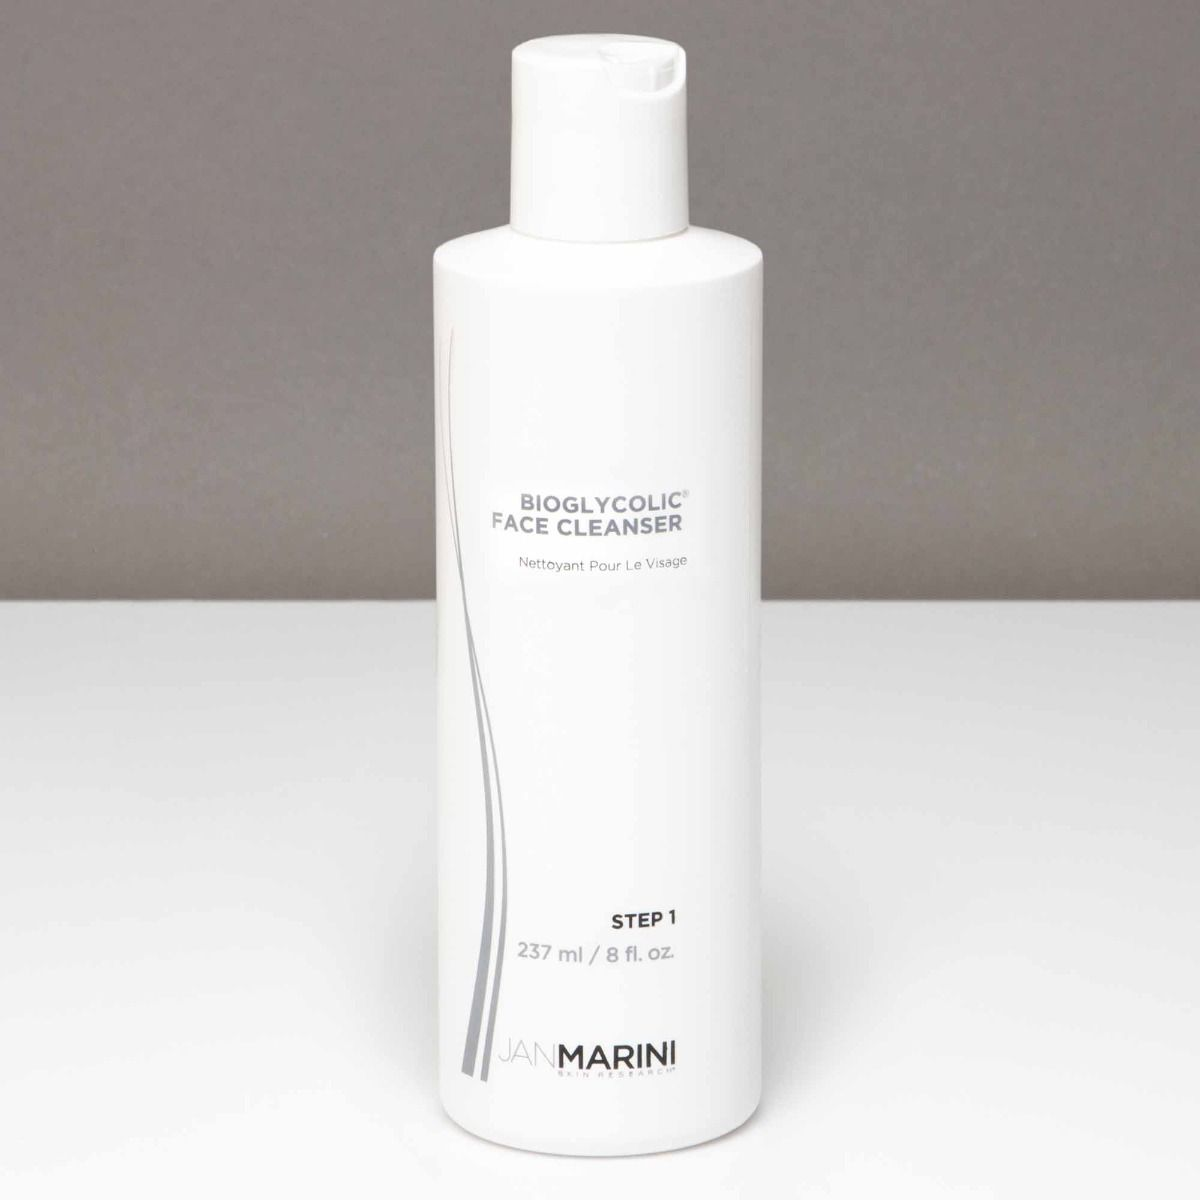 Jan Marini Bioglycolic Face Cleanser 2